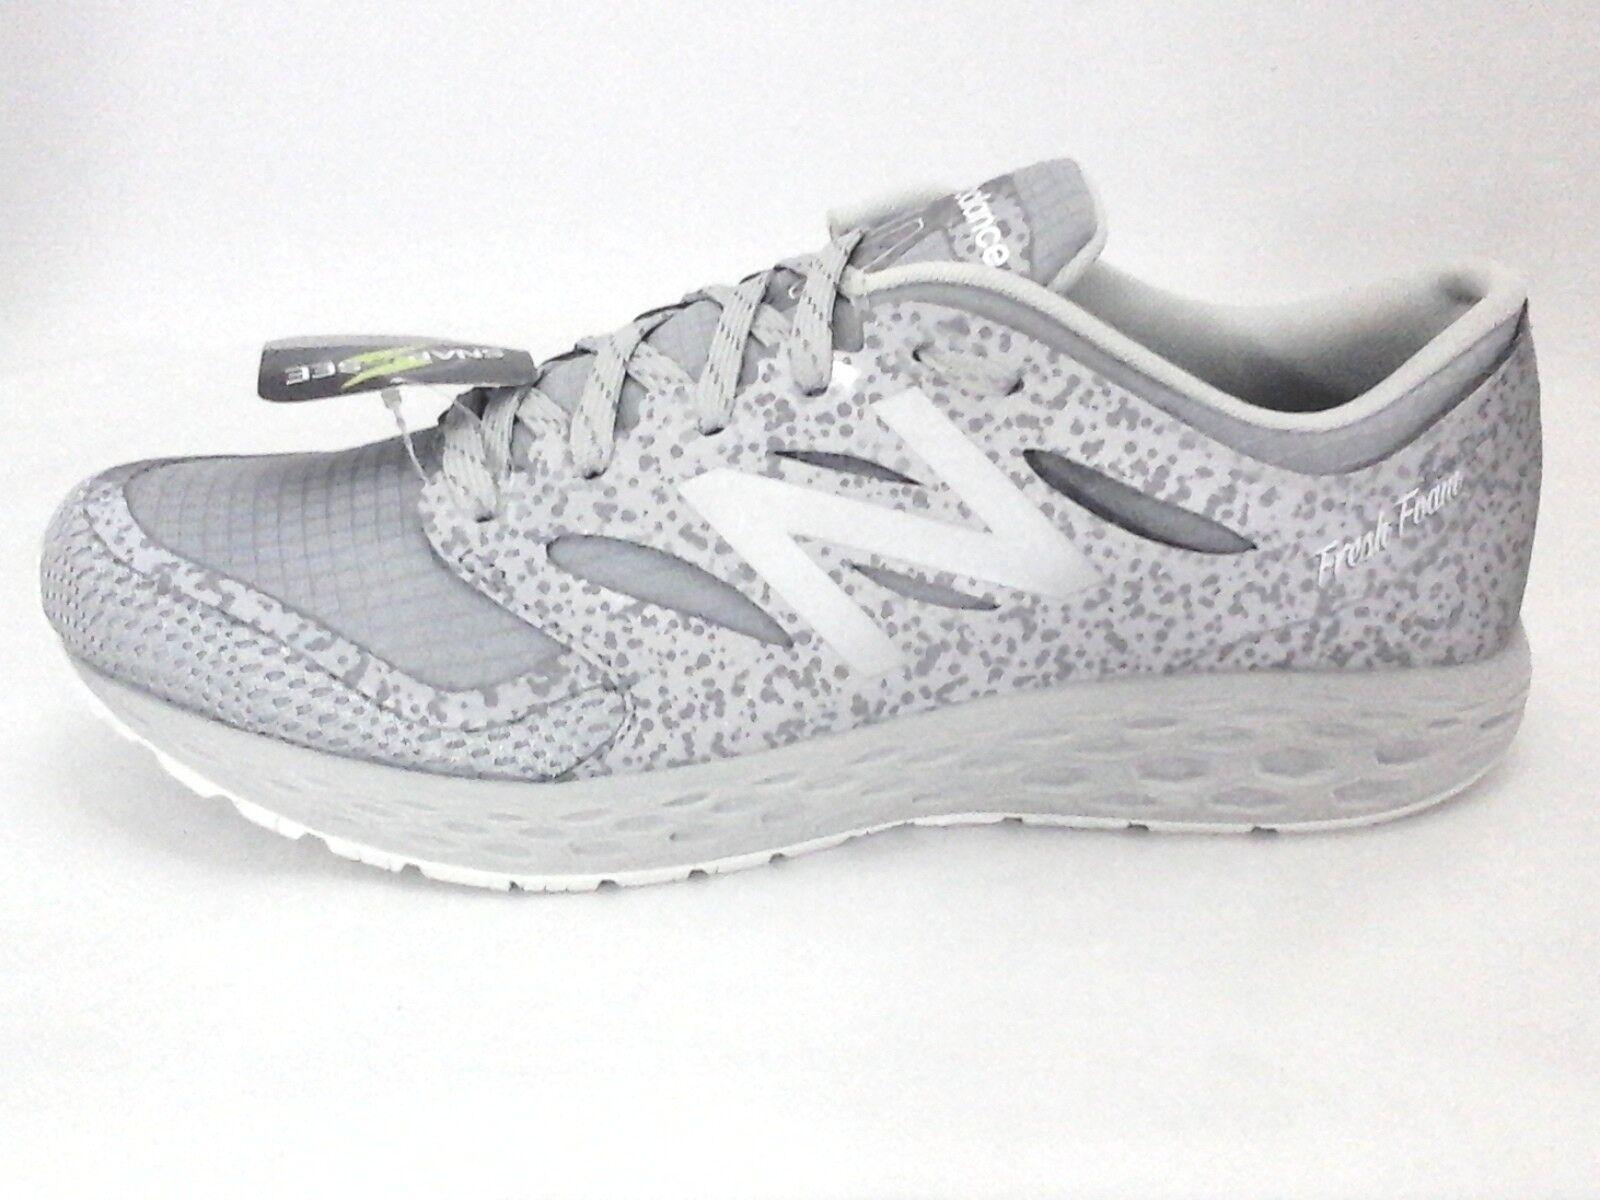 NEW BALANCE Fresh Foam Bonacay Reflective Sneakers Gray Mens US 9 /42.5 2E Wide